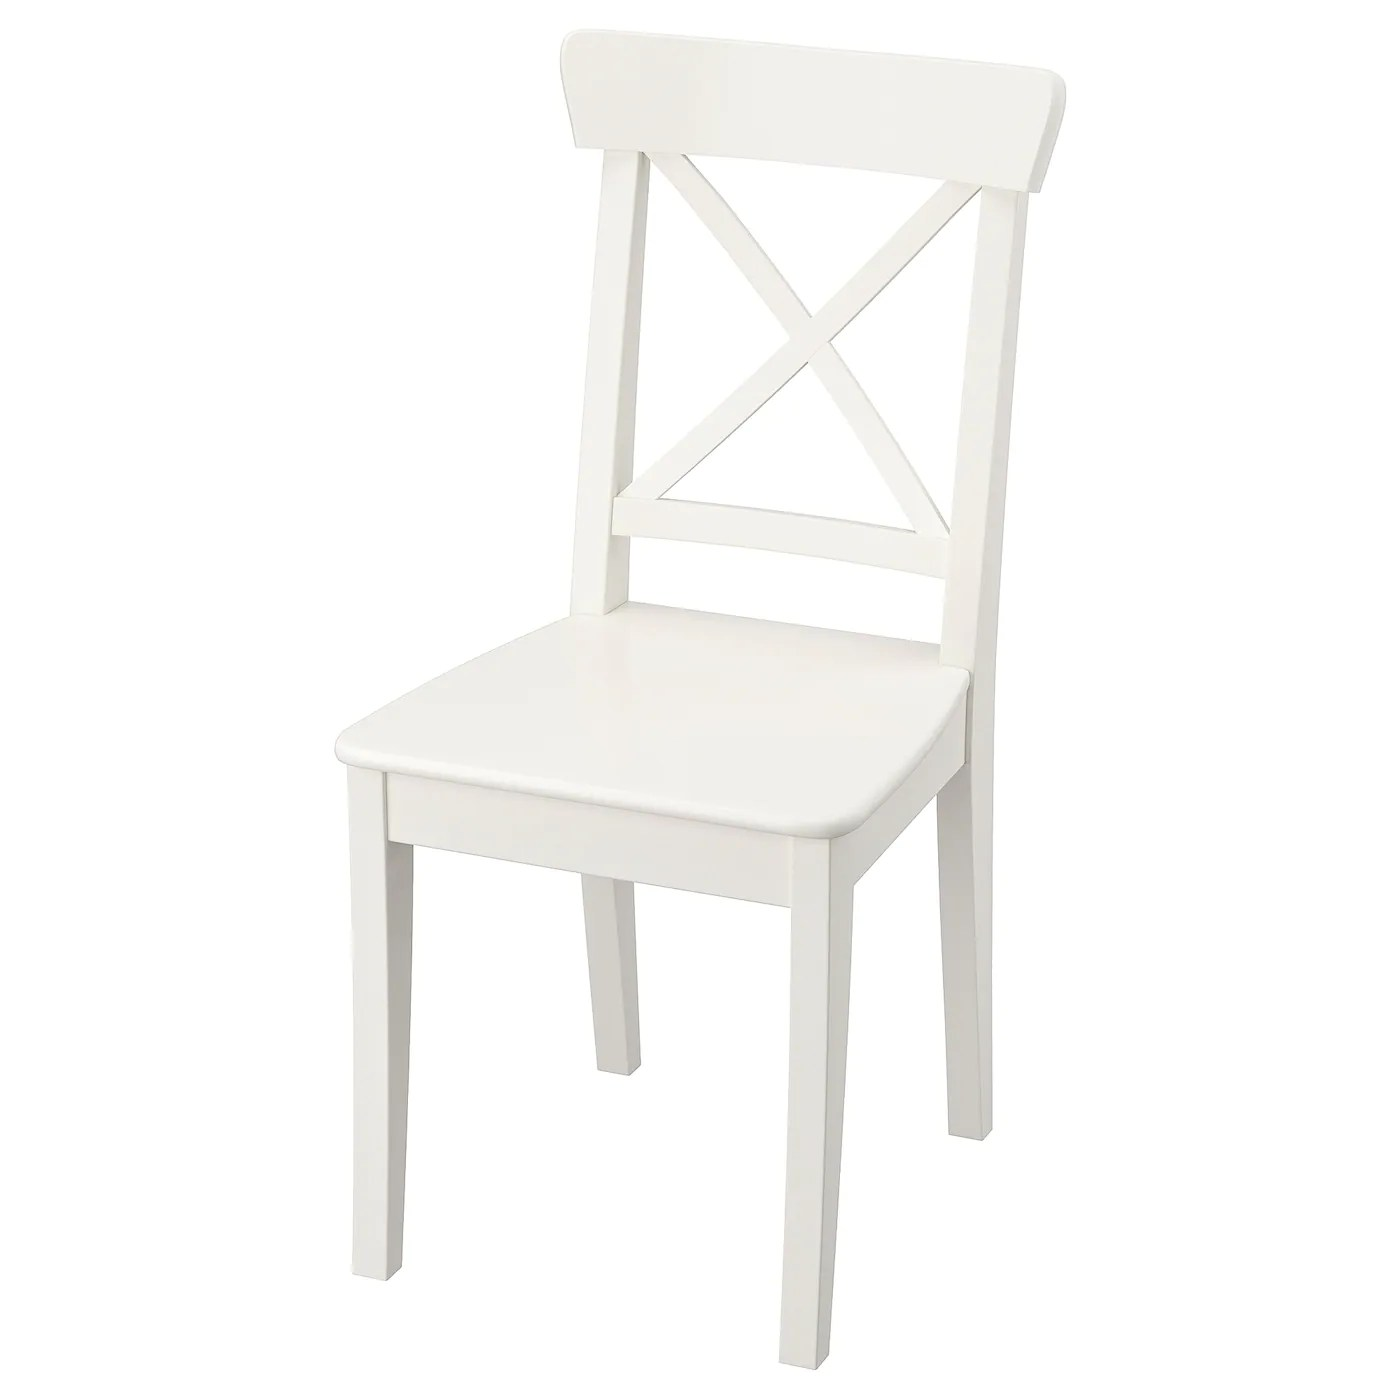 ingolf chaise blanc